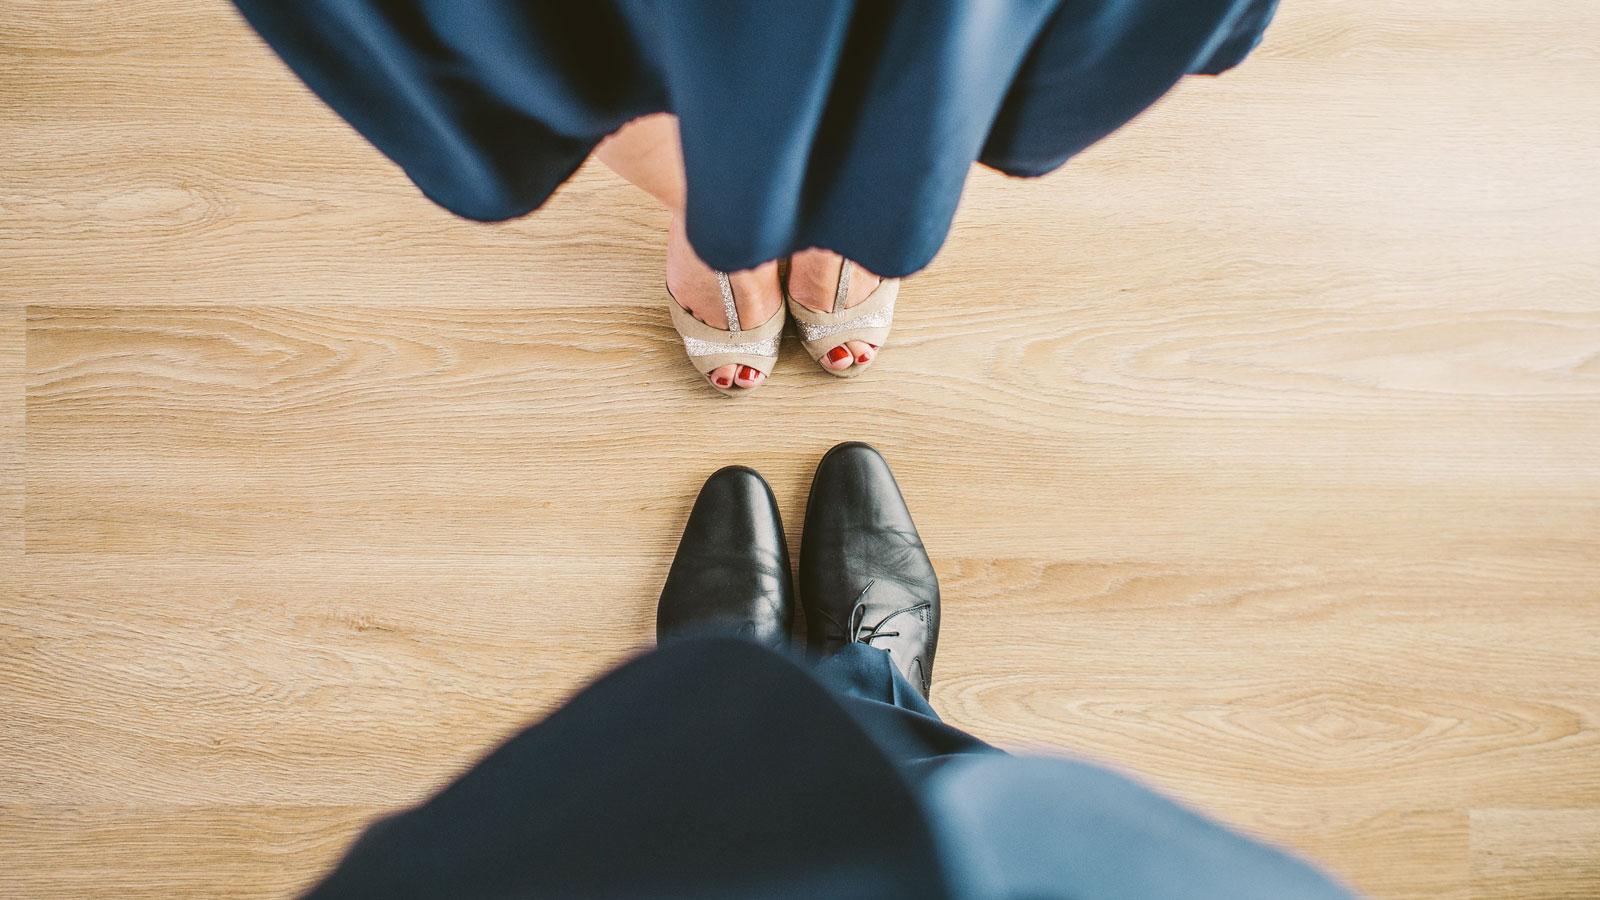 sapato-ideal-pra-dança